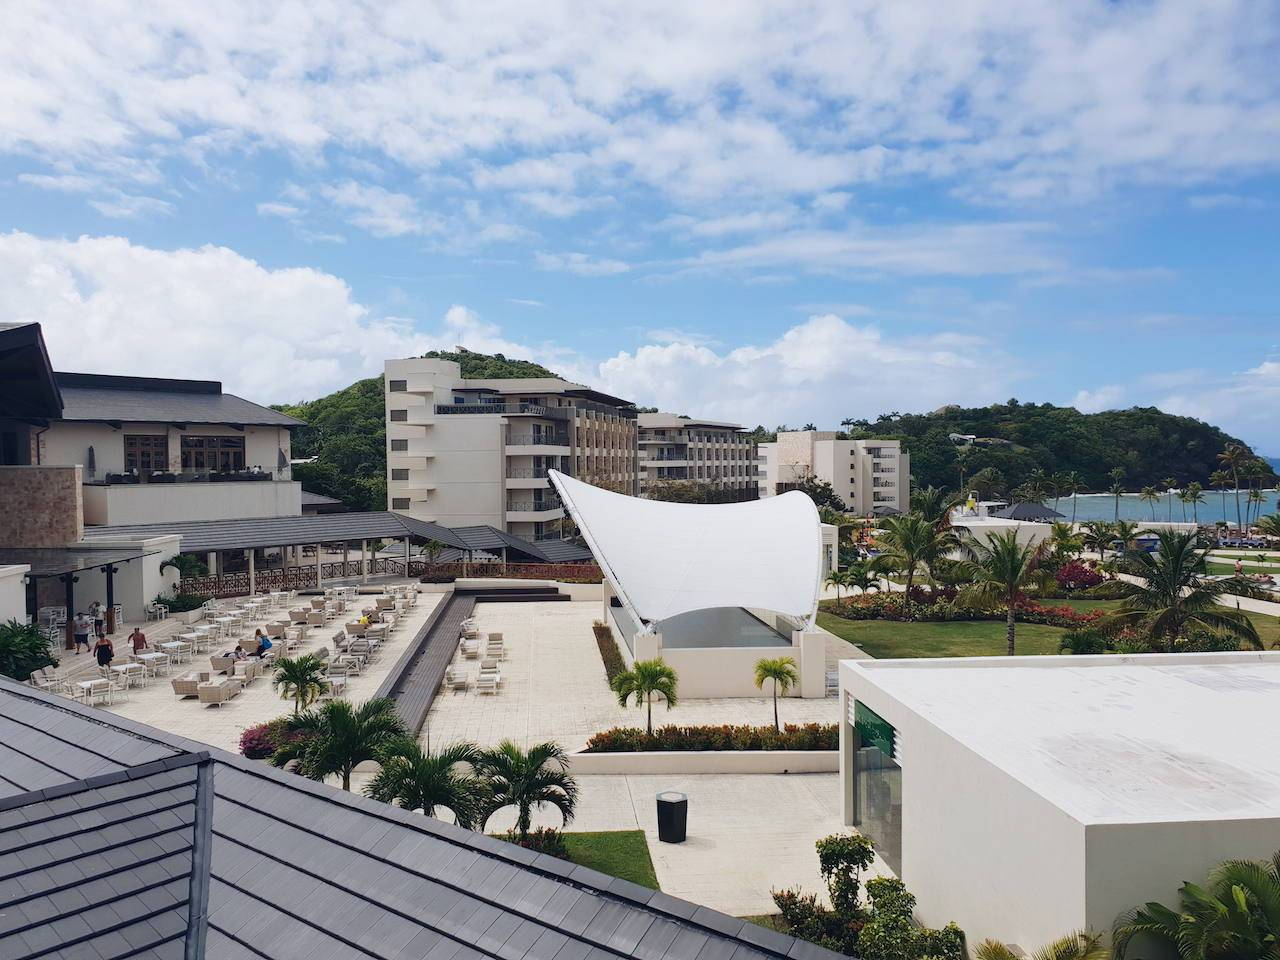 Balcony view of Royalton Saint Lucia resort